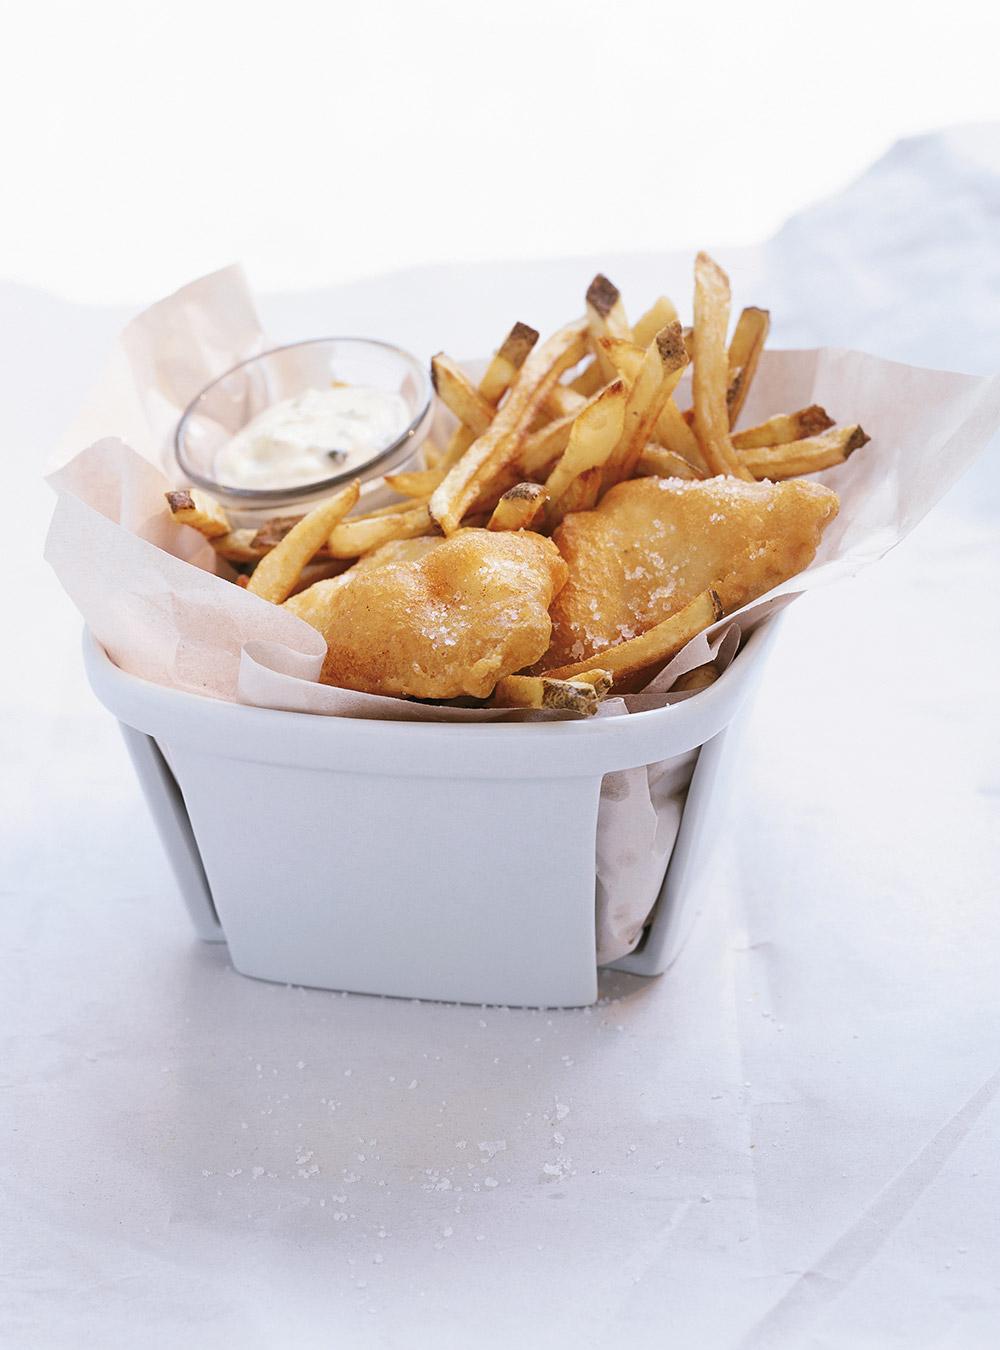 Fish and chips | ricardo